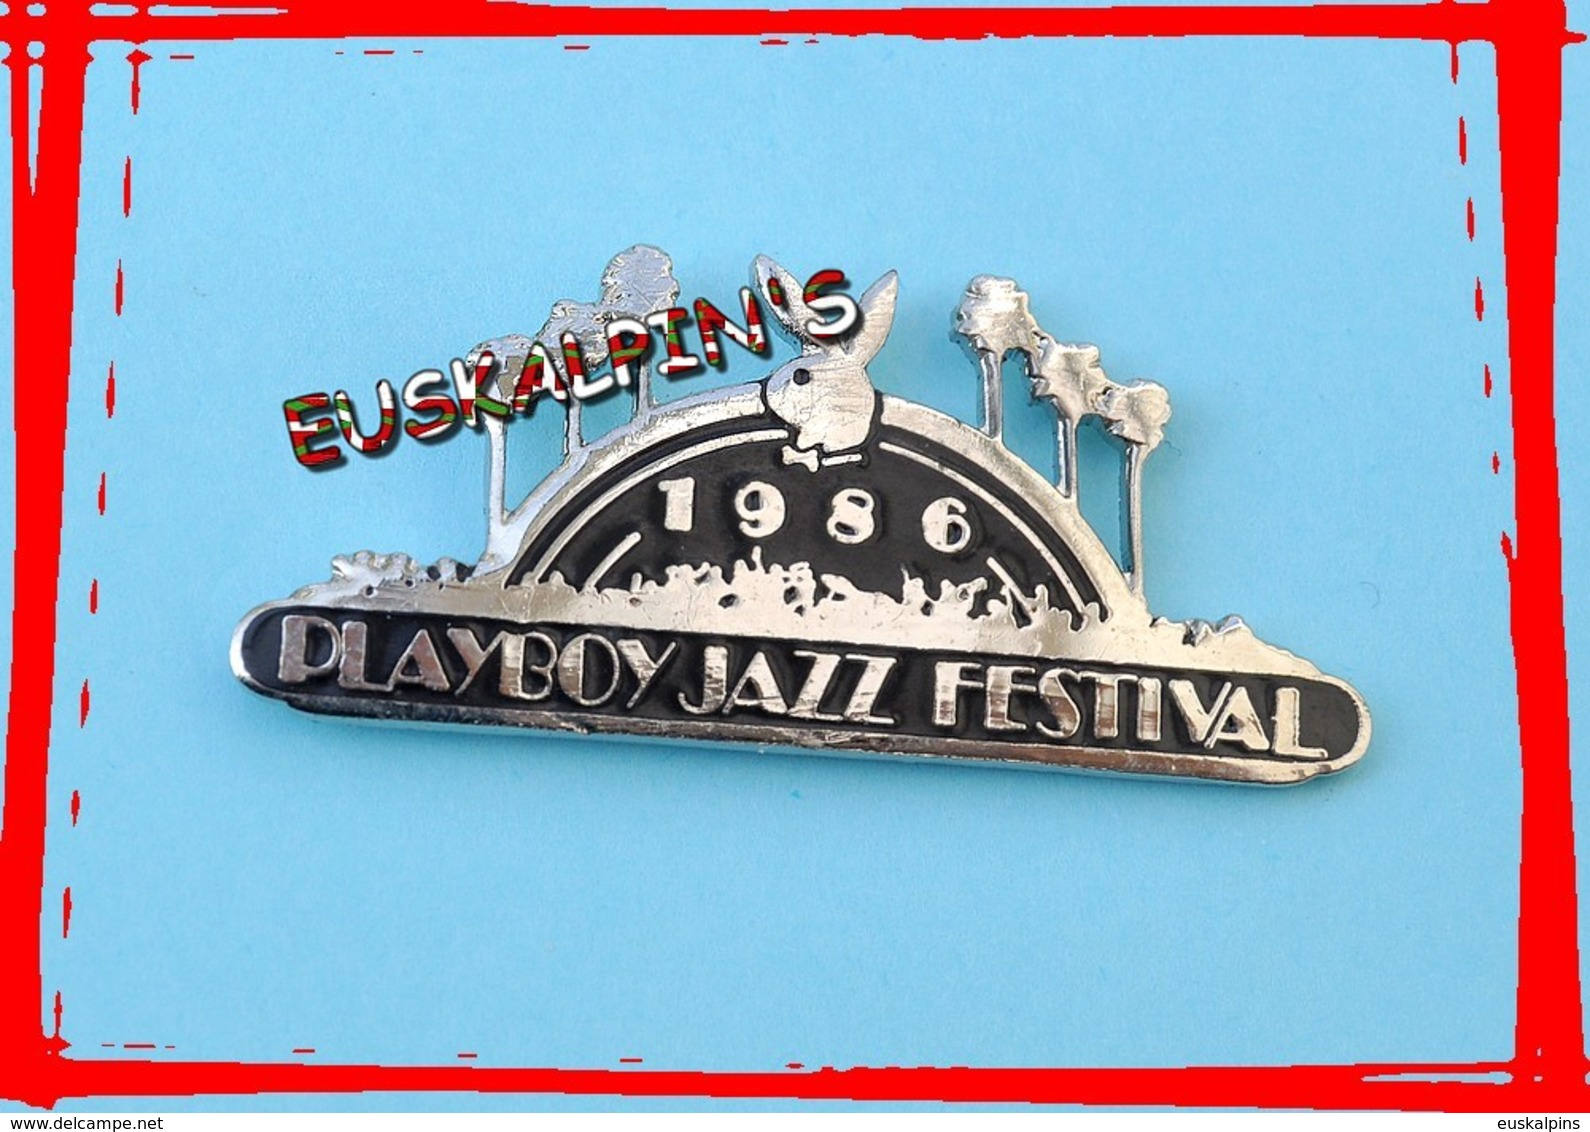 Pin's PLAYBOY JAZZ Festival 1986, LOS ANGELES, U.S.A - Musique